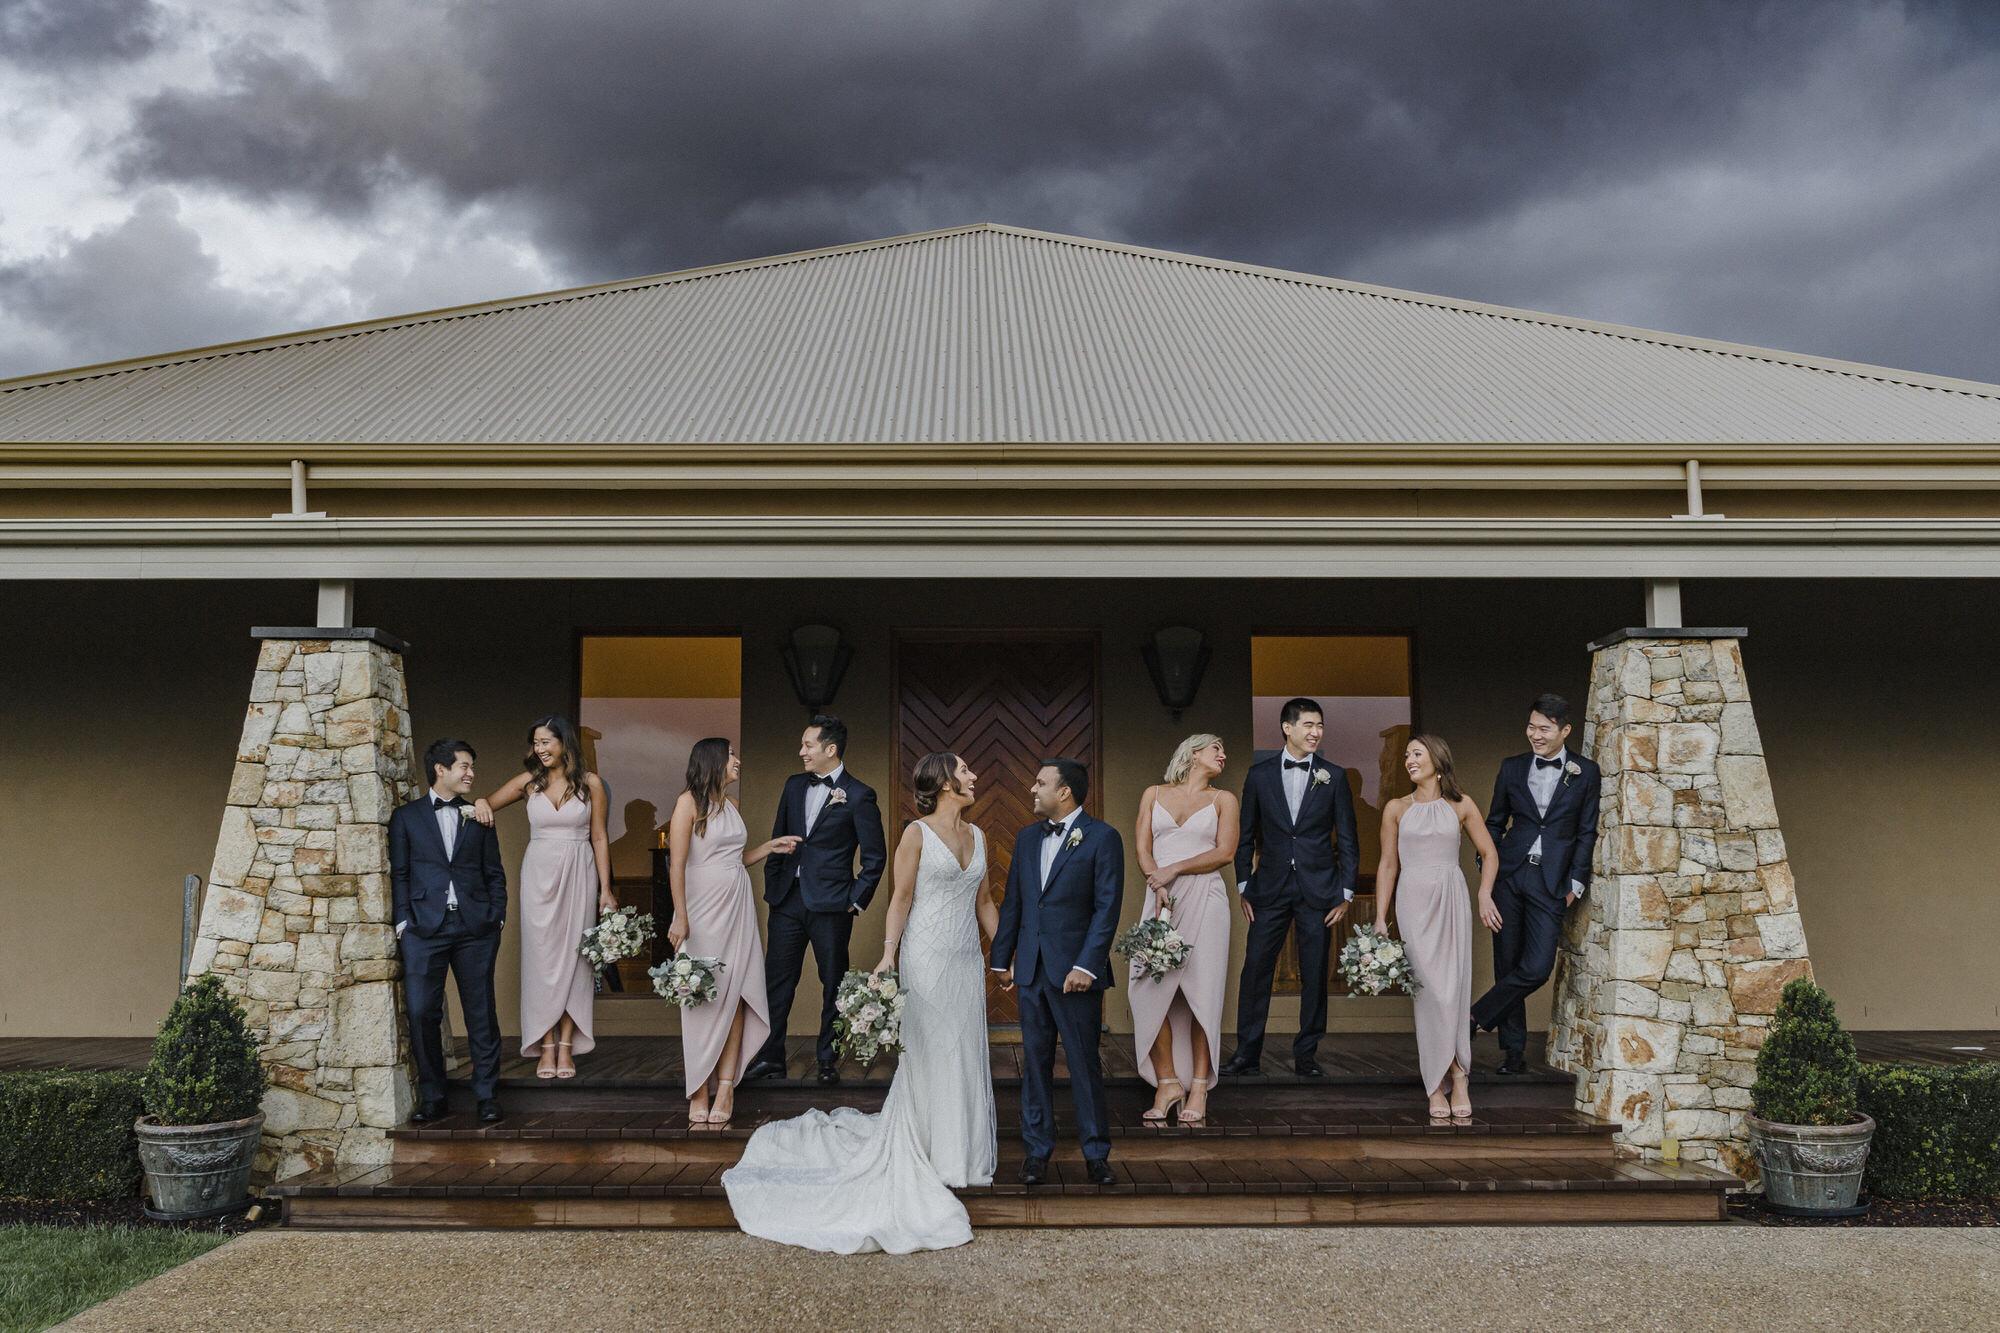 Corey Wright Vue on Halcyon Wedding Photography_002.jpg